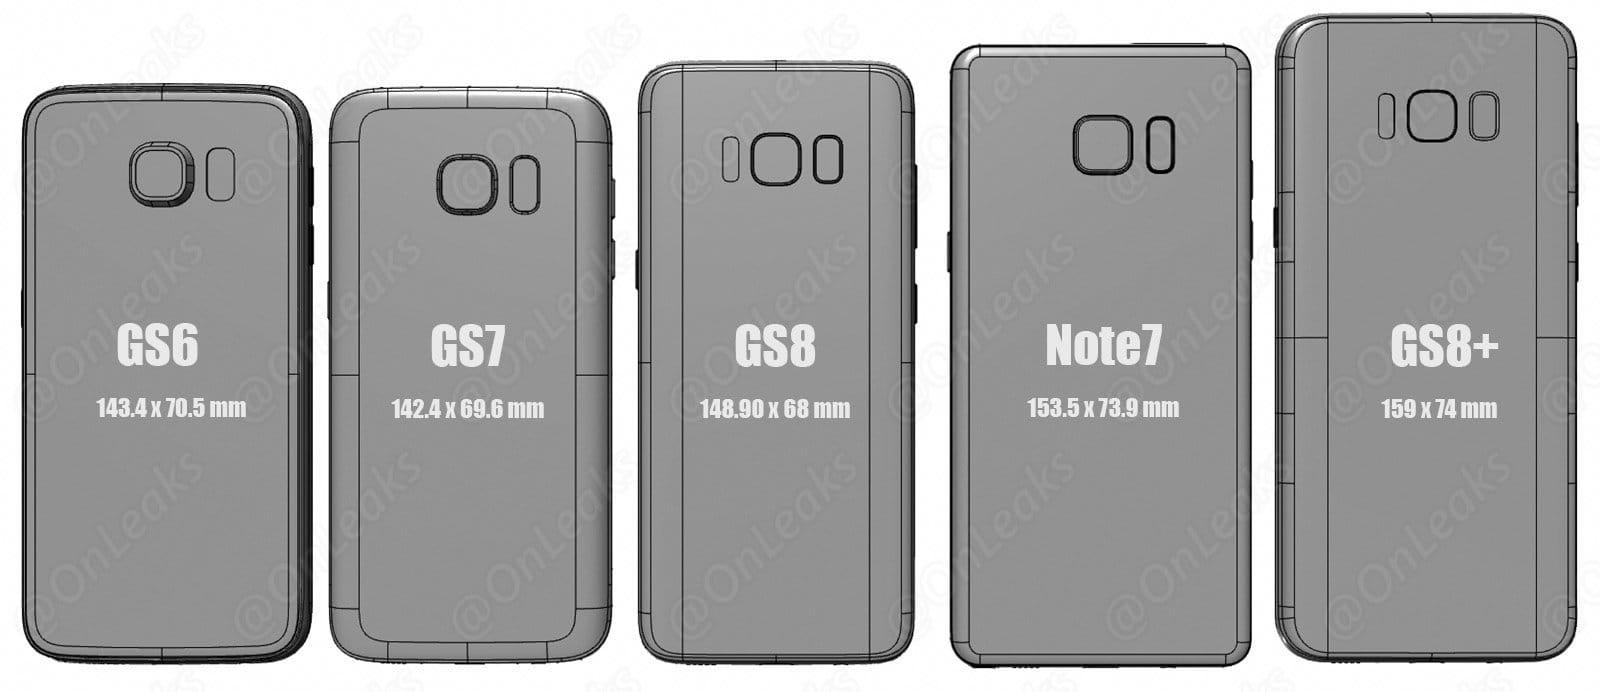 Samsung Galaxy S7 size iPhone 7 Plus 4